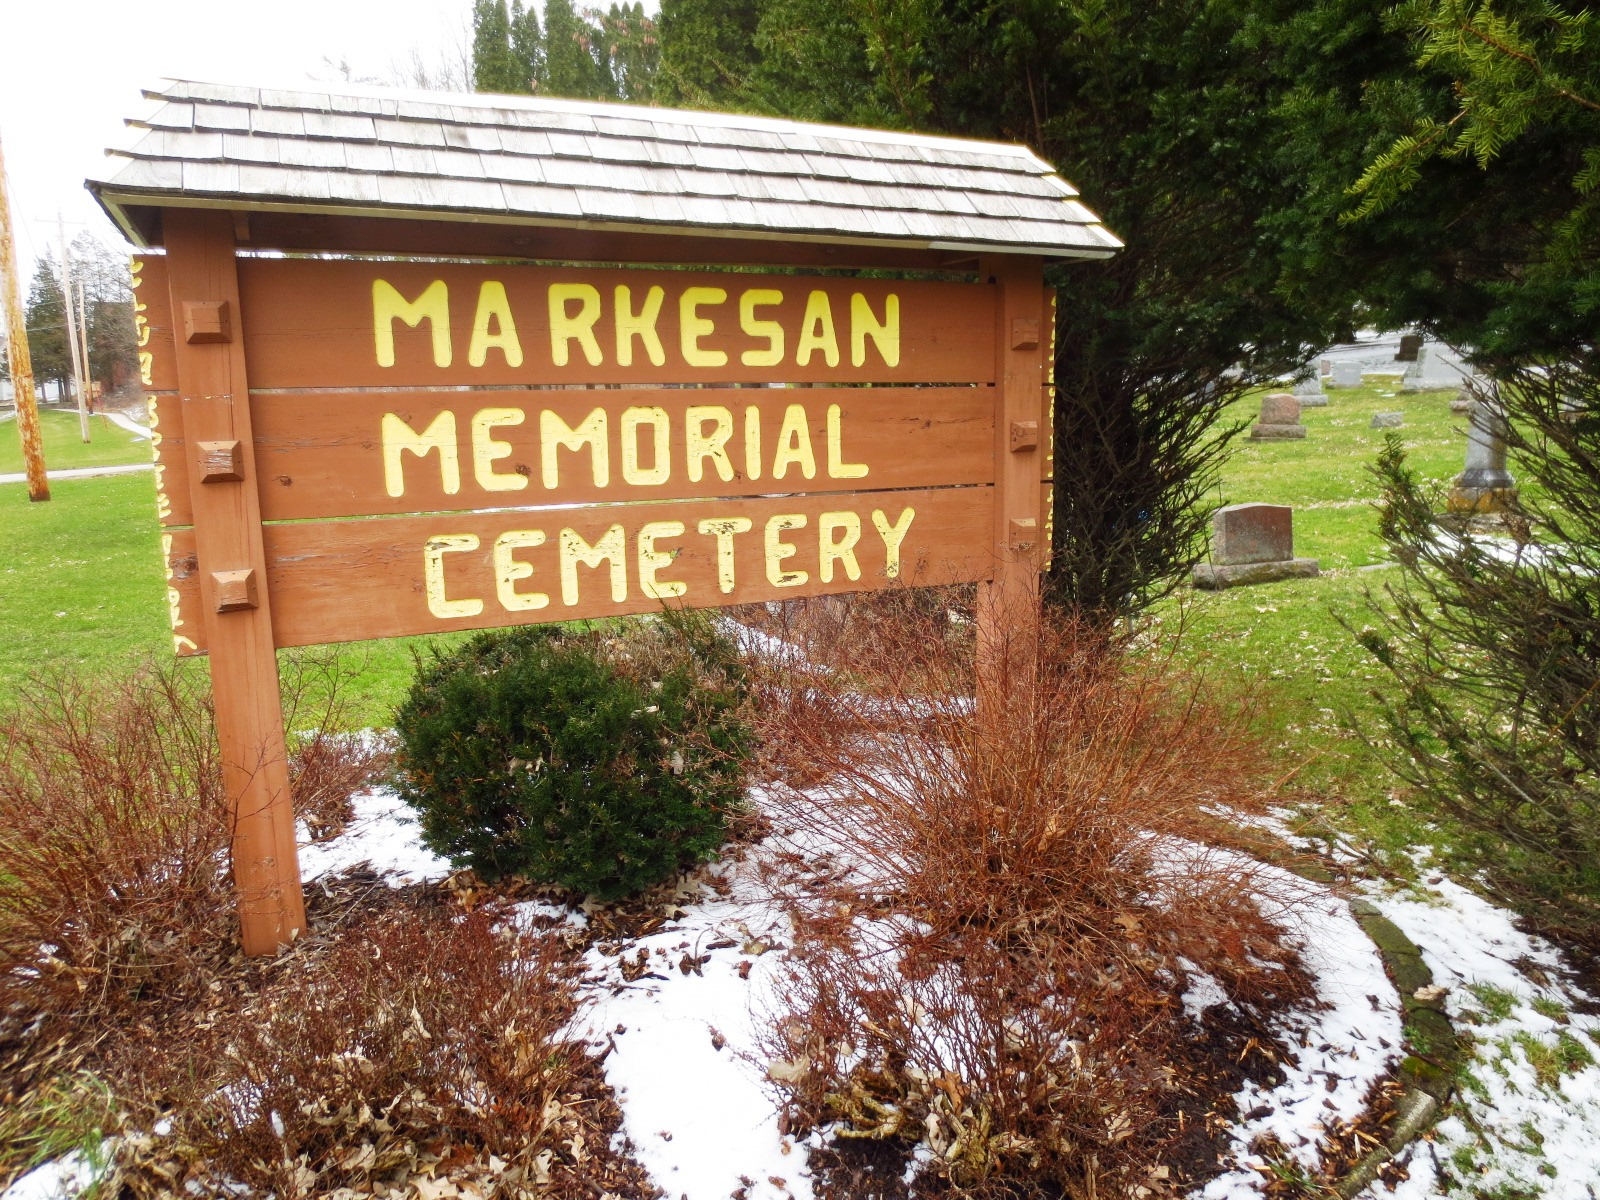 Markesan Memorial Cemetery